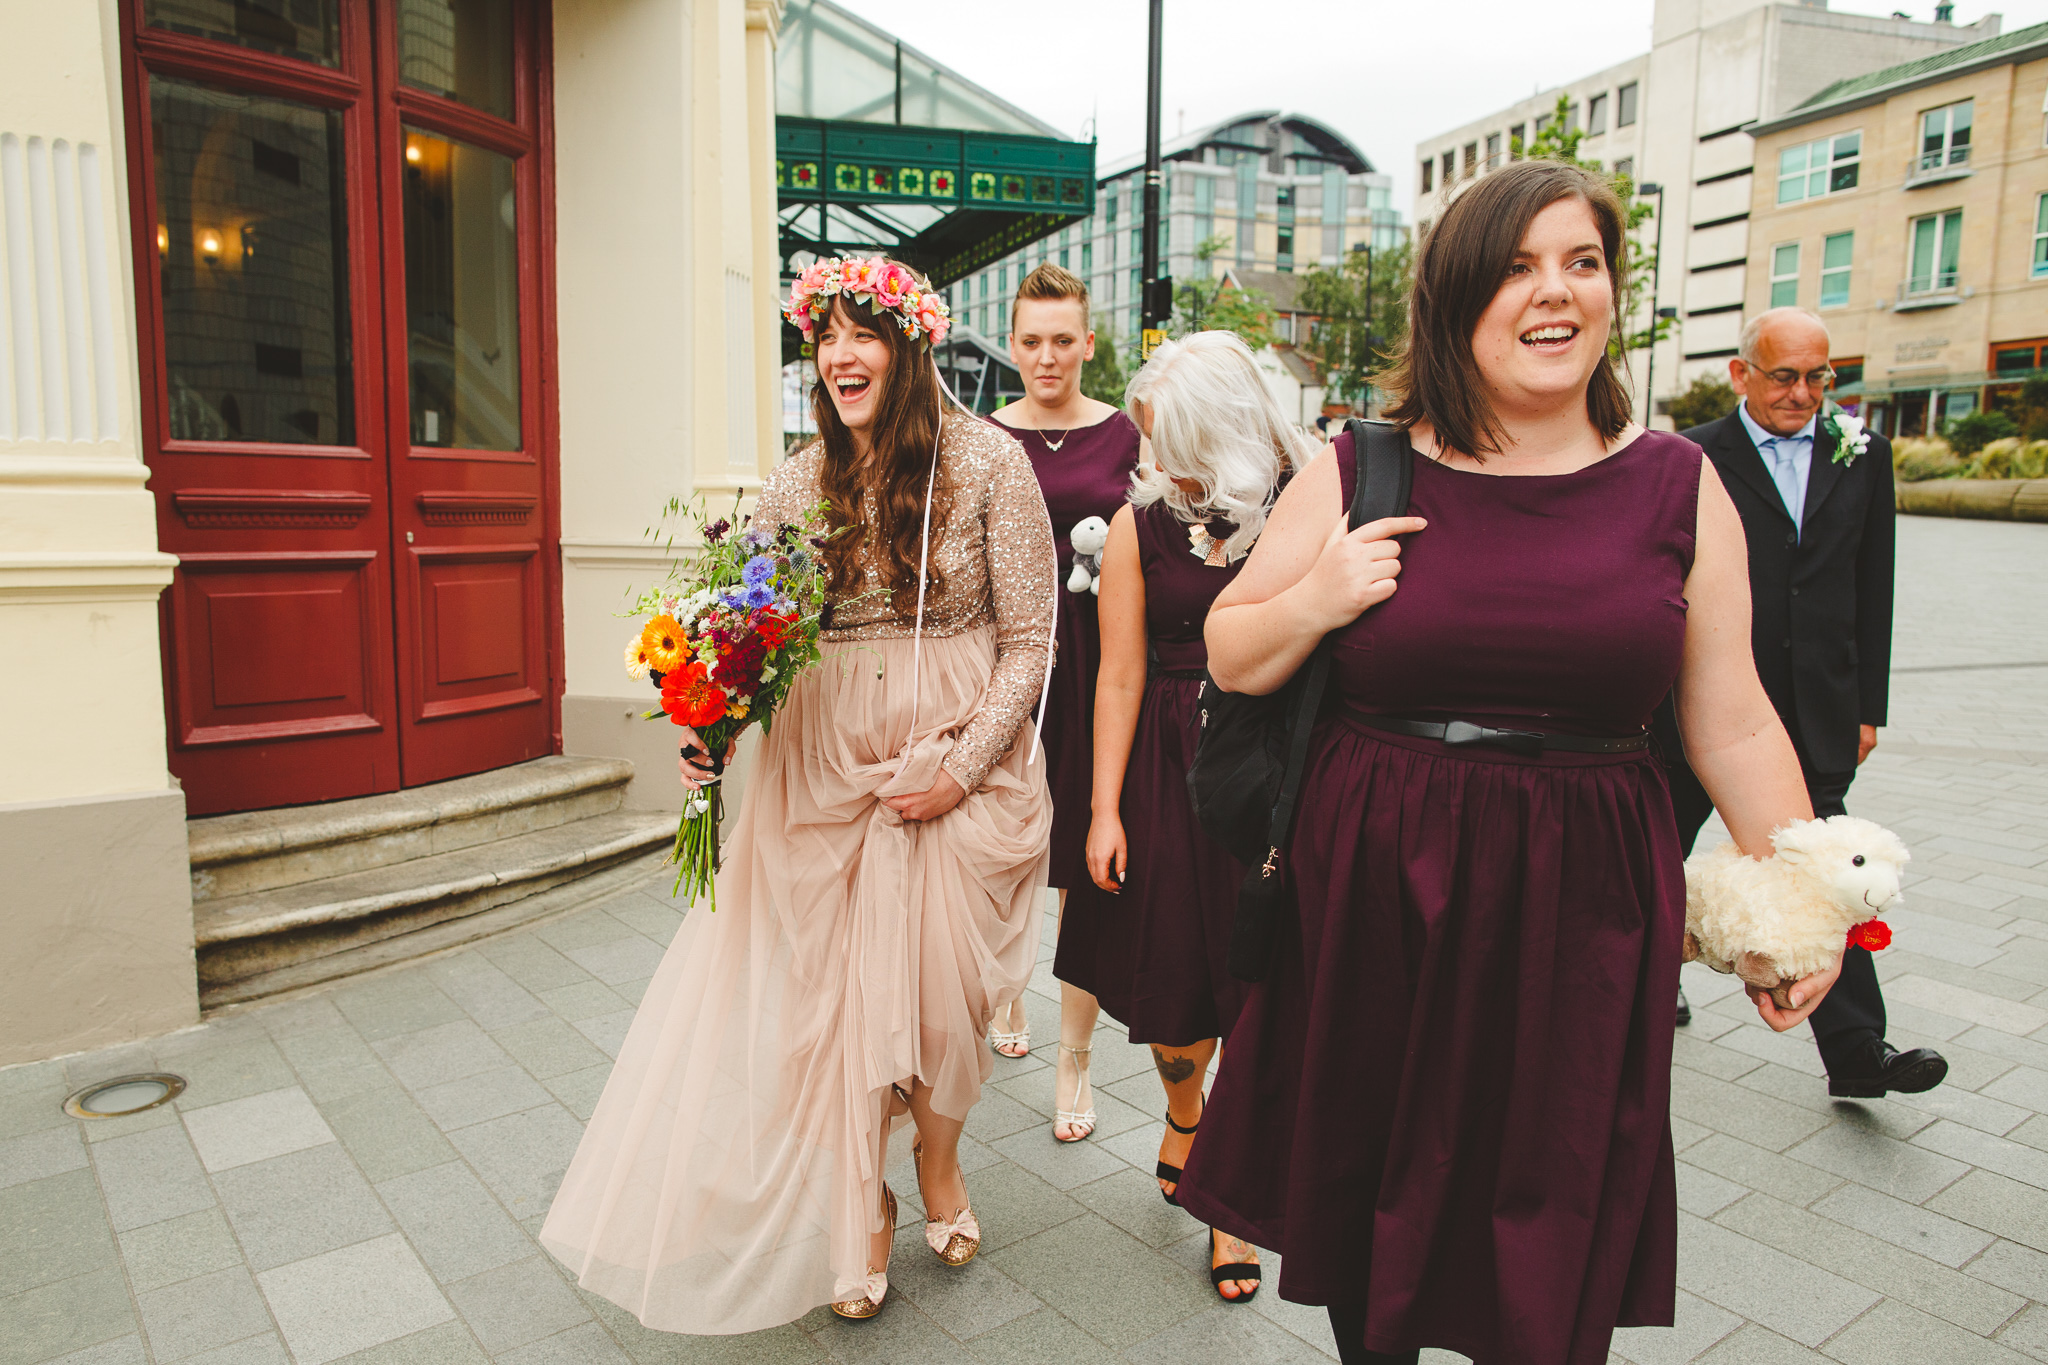 sheffield-wedding-photographer-roxysamblog-13.jpg